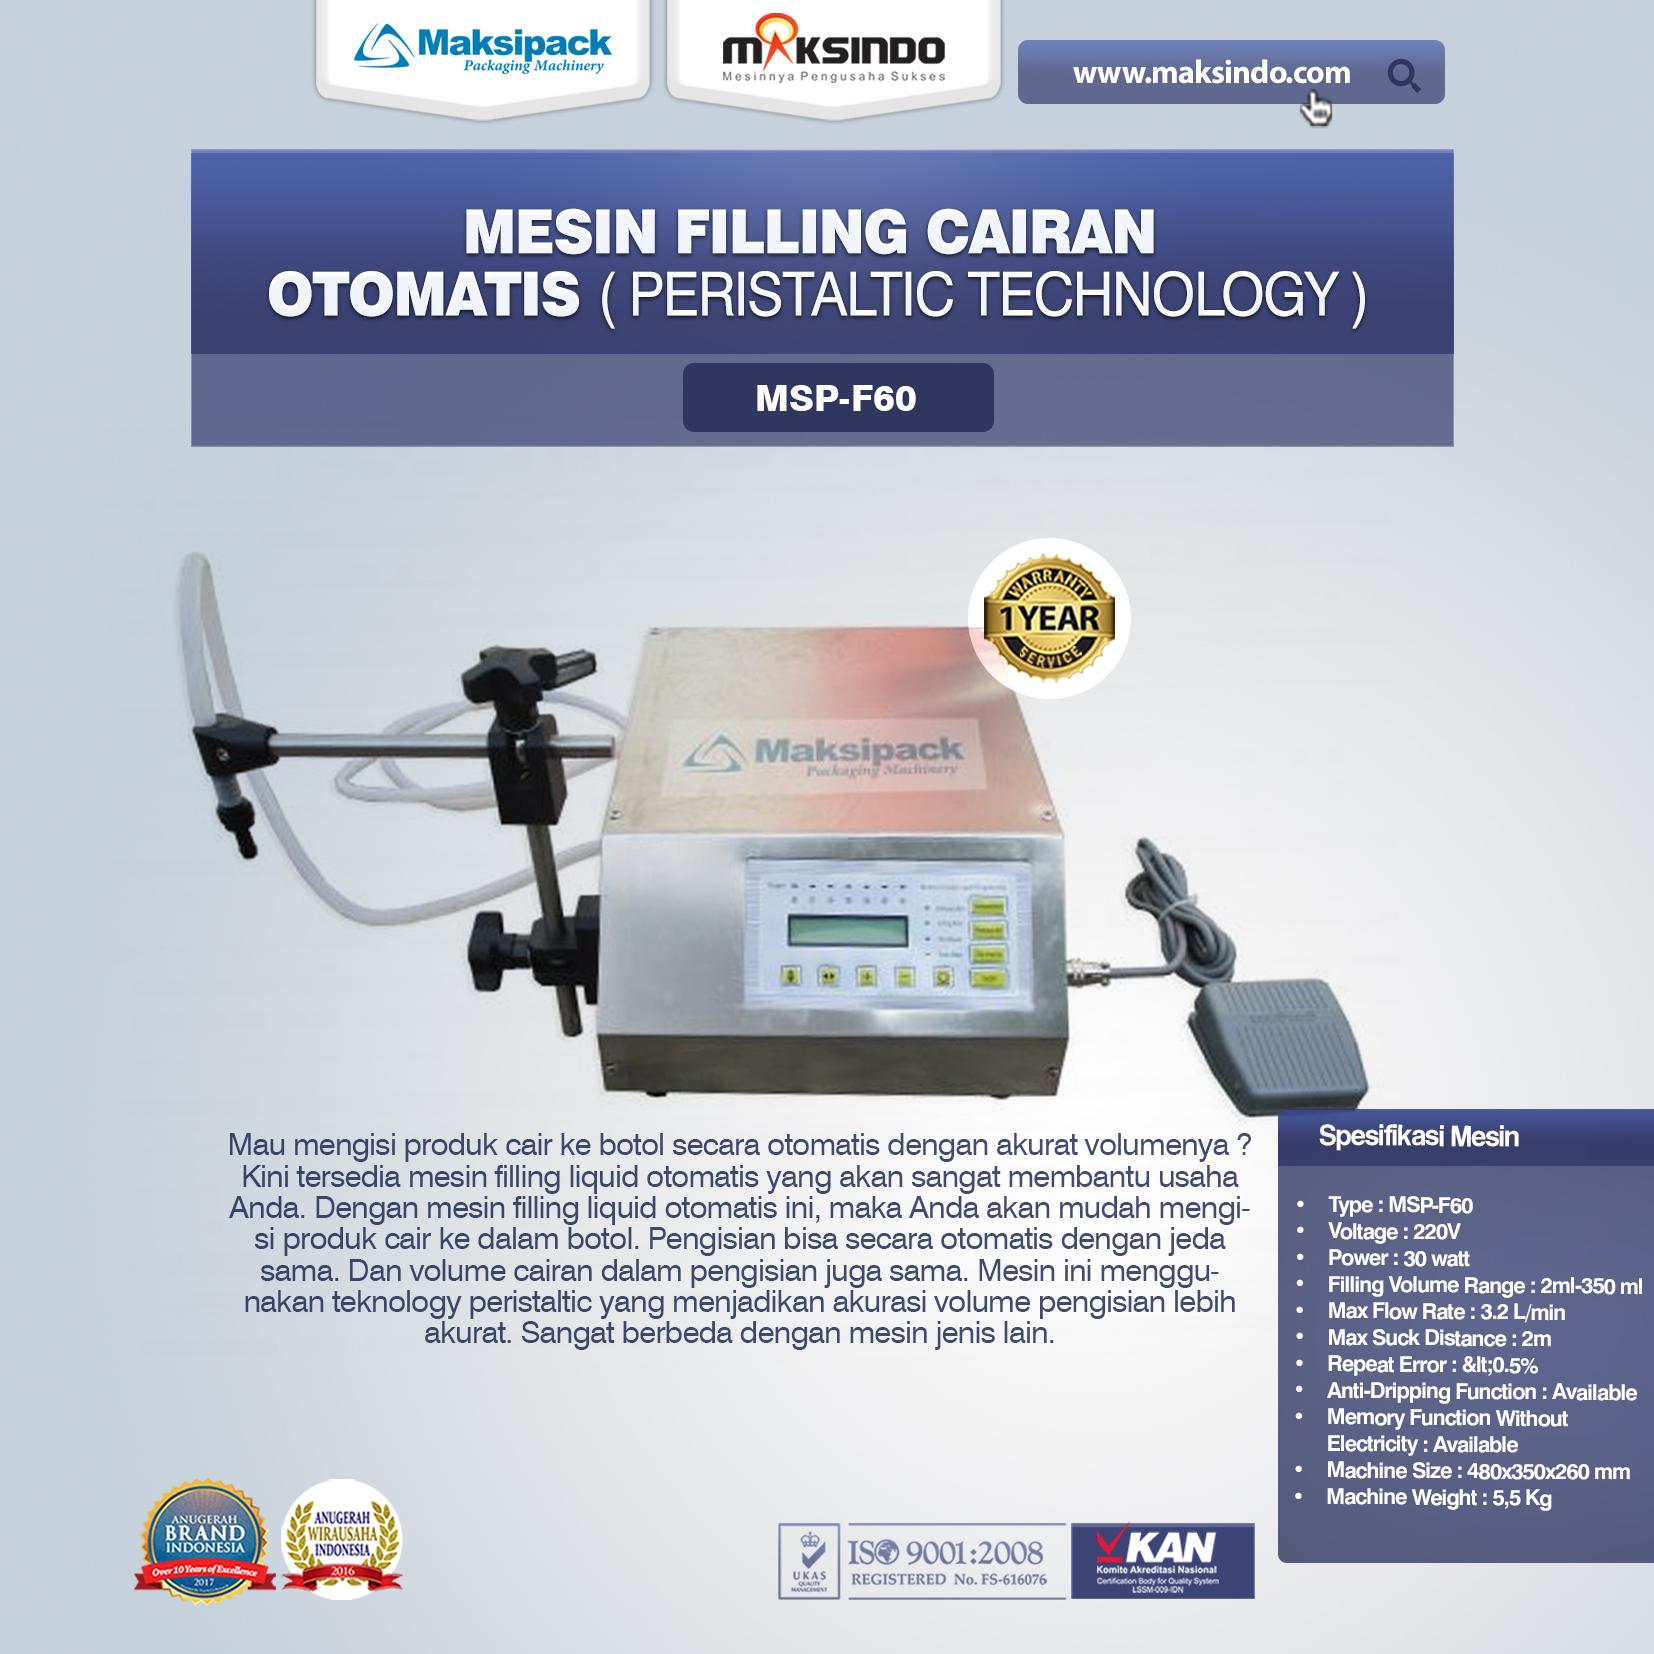 Mesin Filling Cairan Otomatis MSP-F60